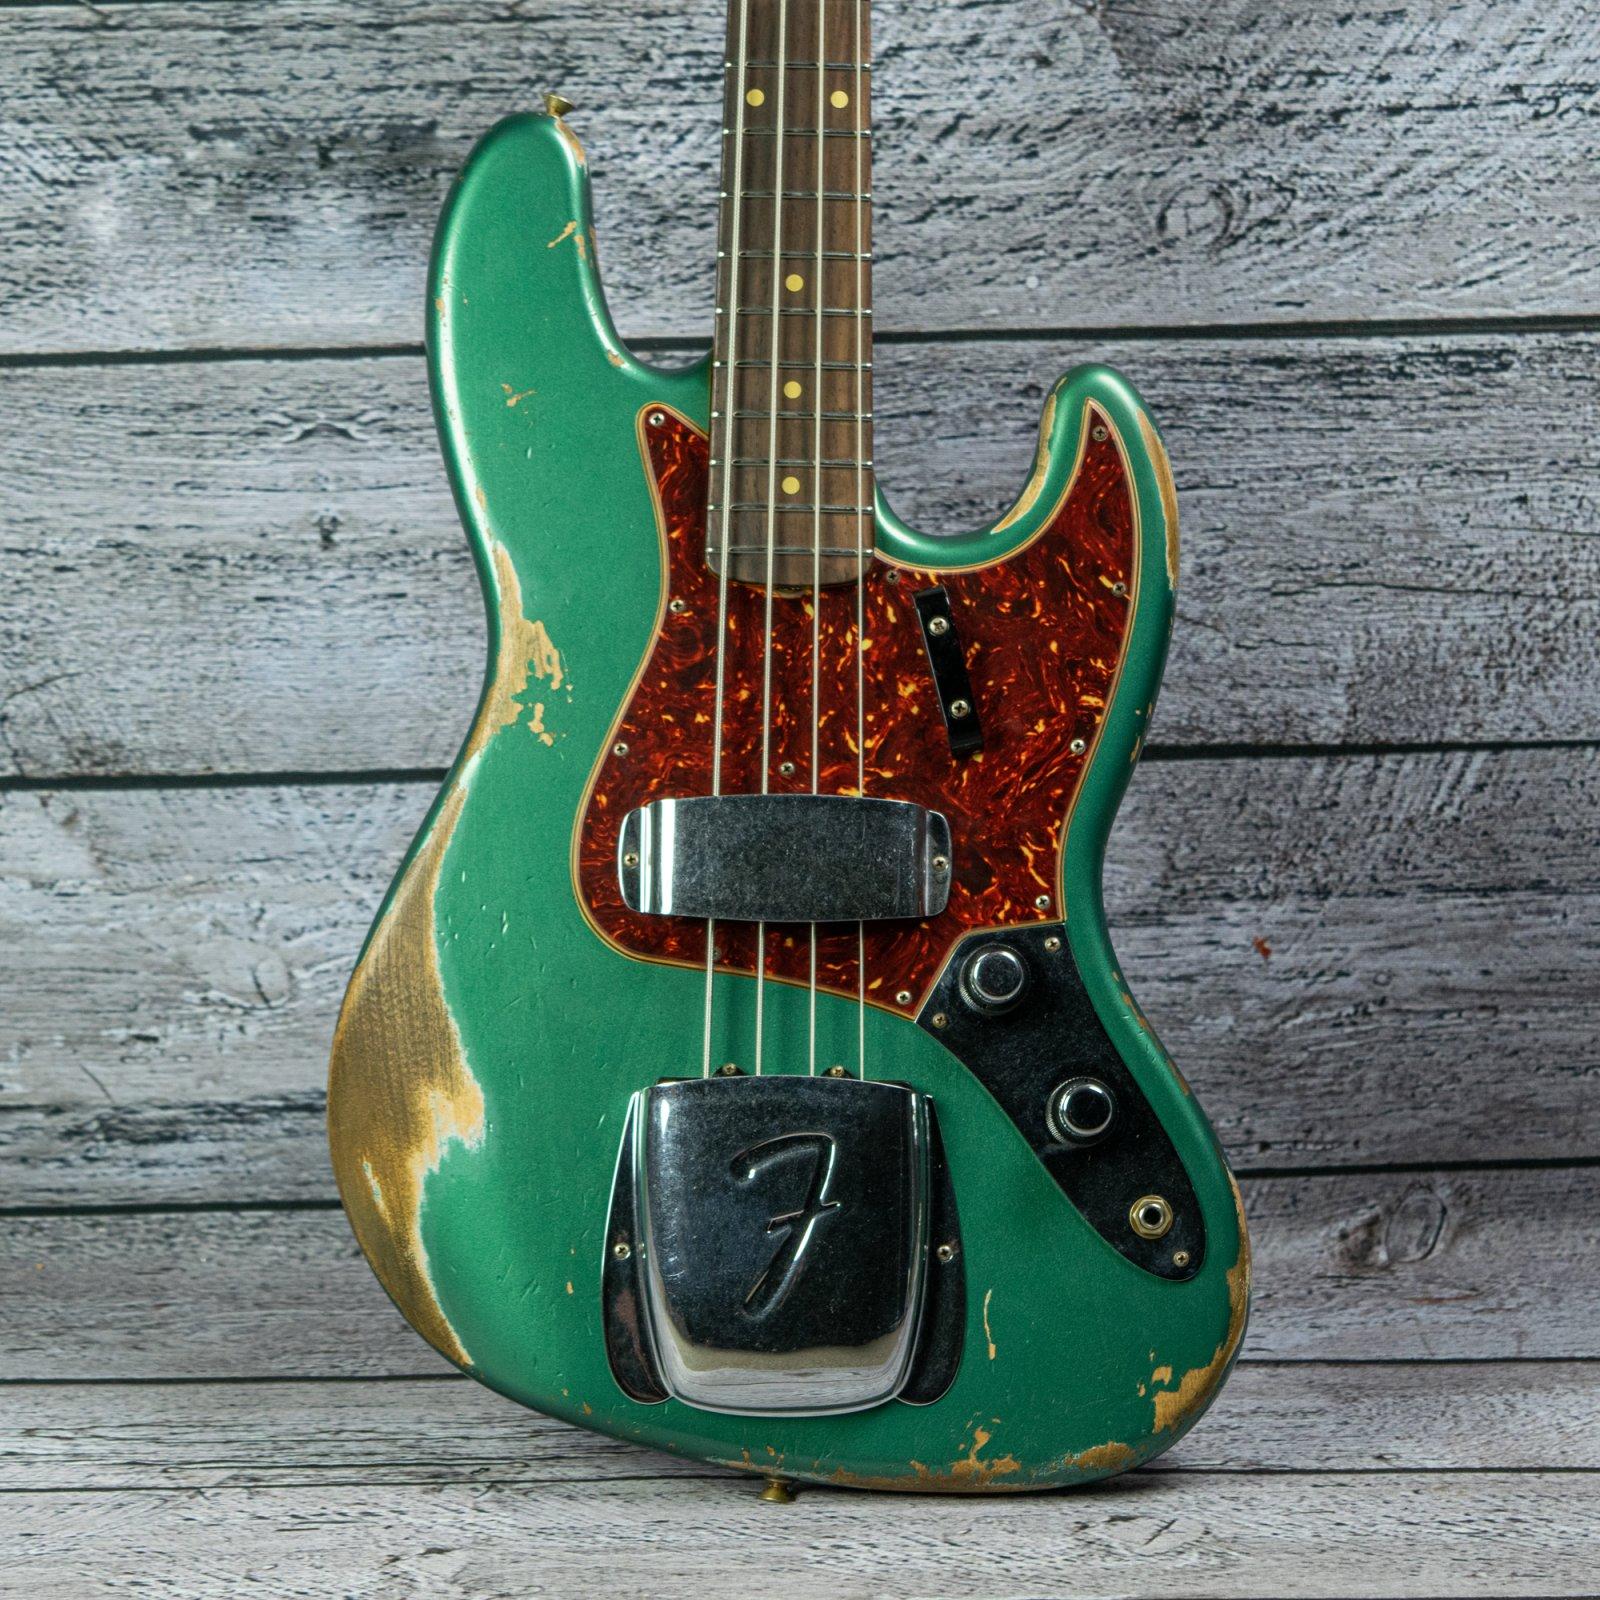 Fender Custom Shop 1960 Jazz Bass Heavy Relic - Sherwood Green